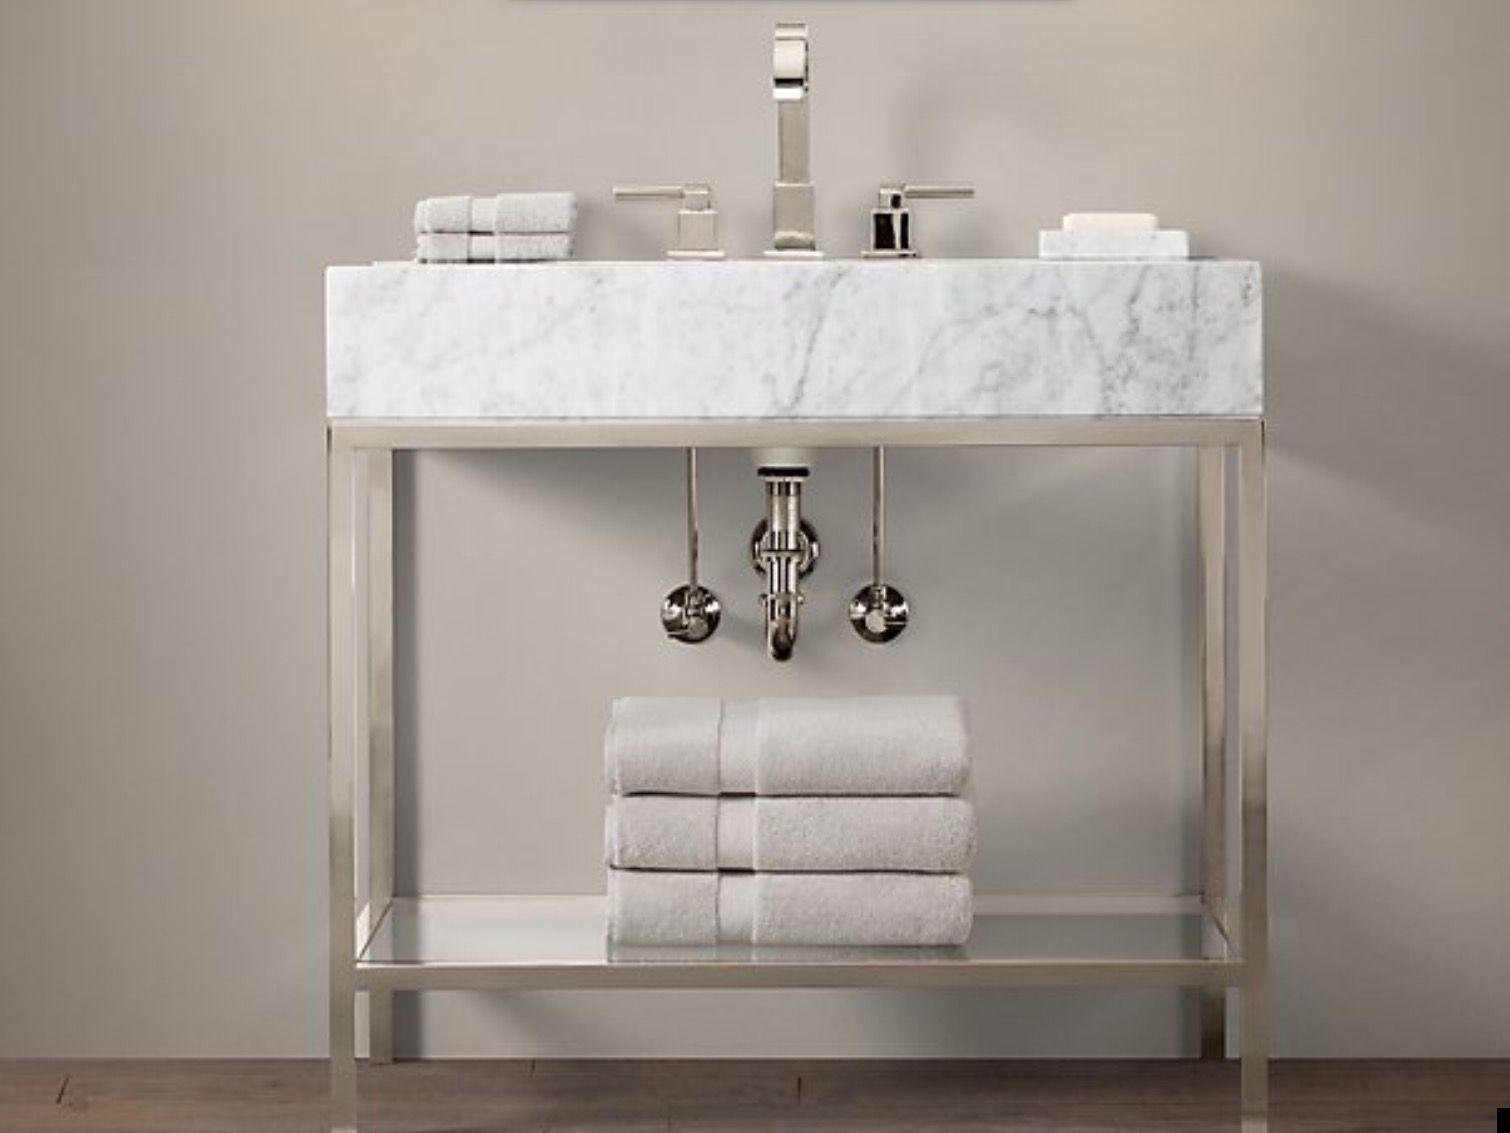 Bathroom Faucets Restoration Hardware rh hudson metal single washstand- in polished nickel with italian